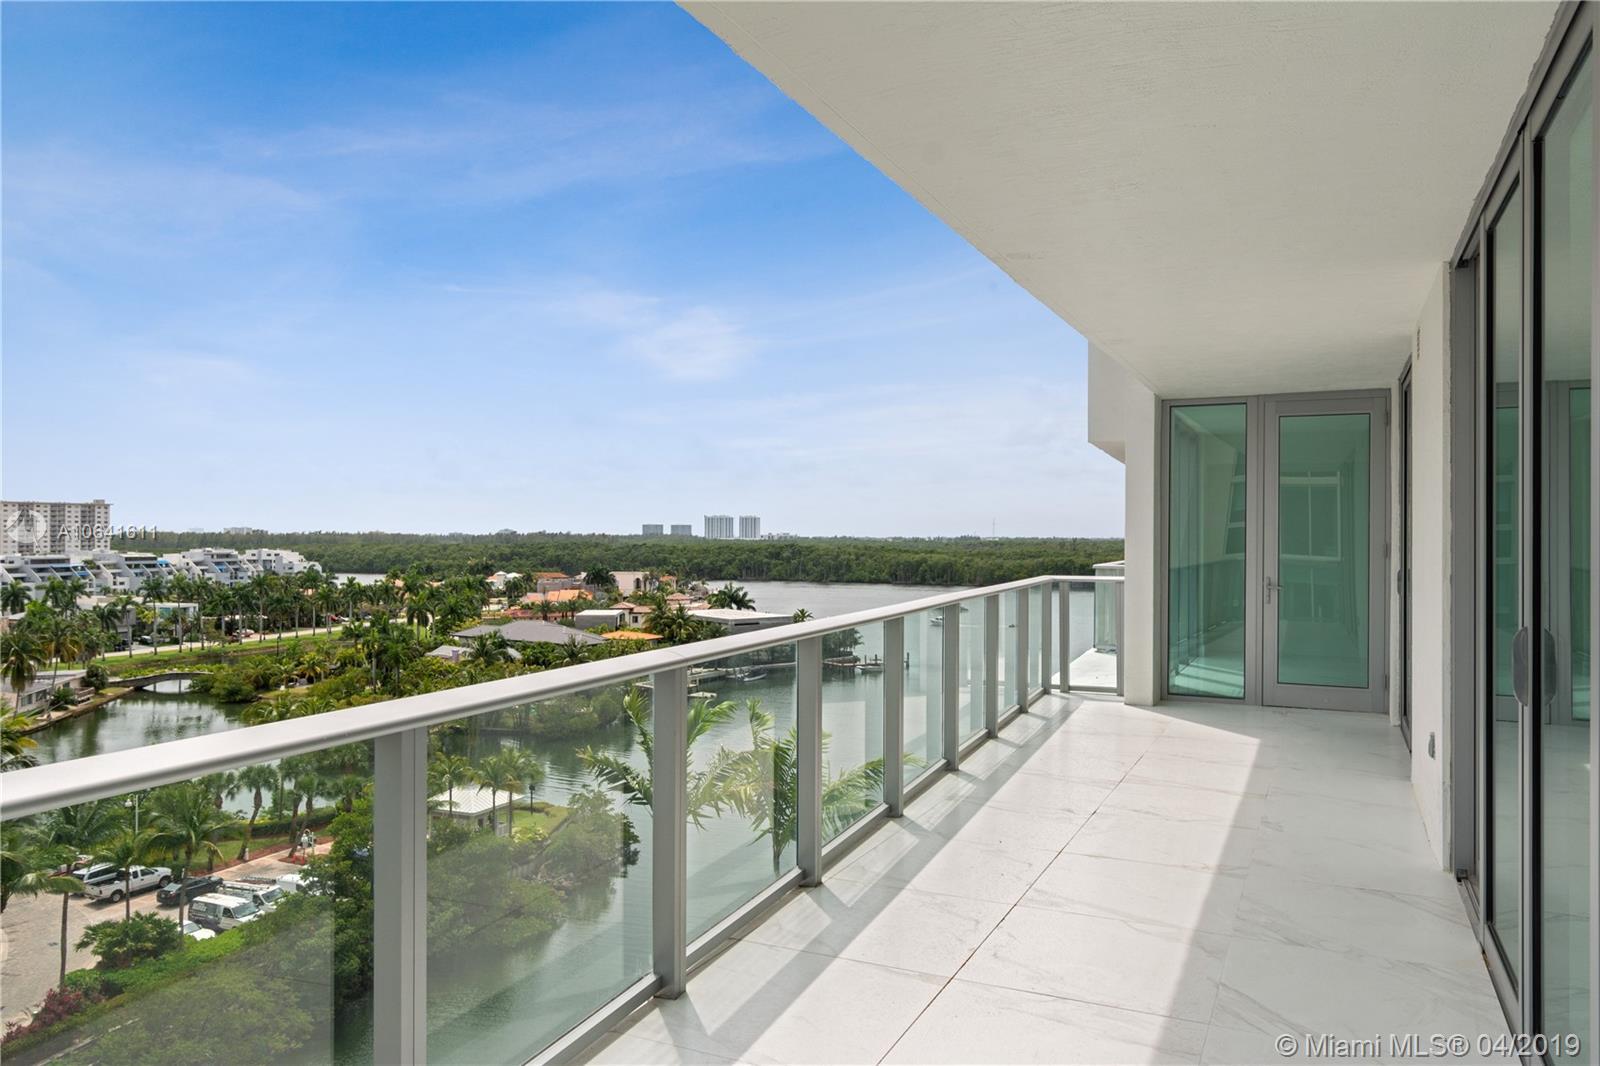 Parque Tower 1 #802 - 300 Sunny Isles Blvd. #802, Sunny Isles Beach, FL 33160